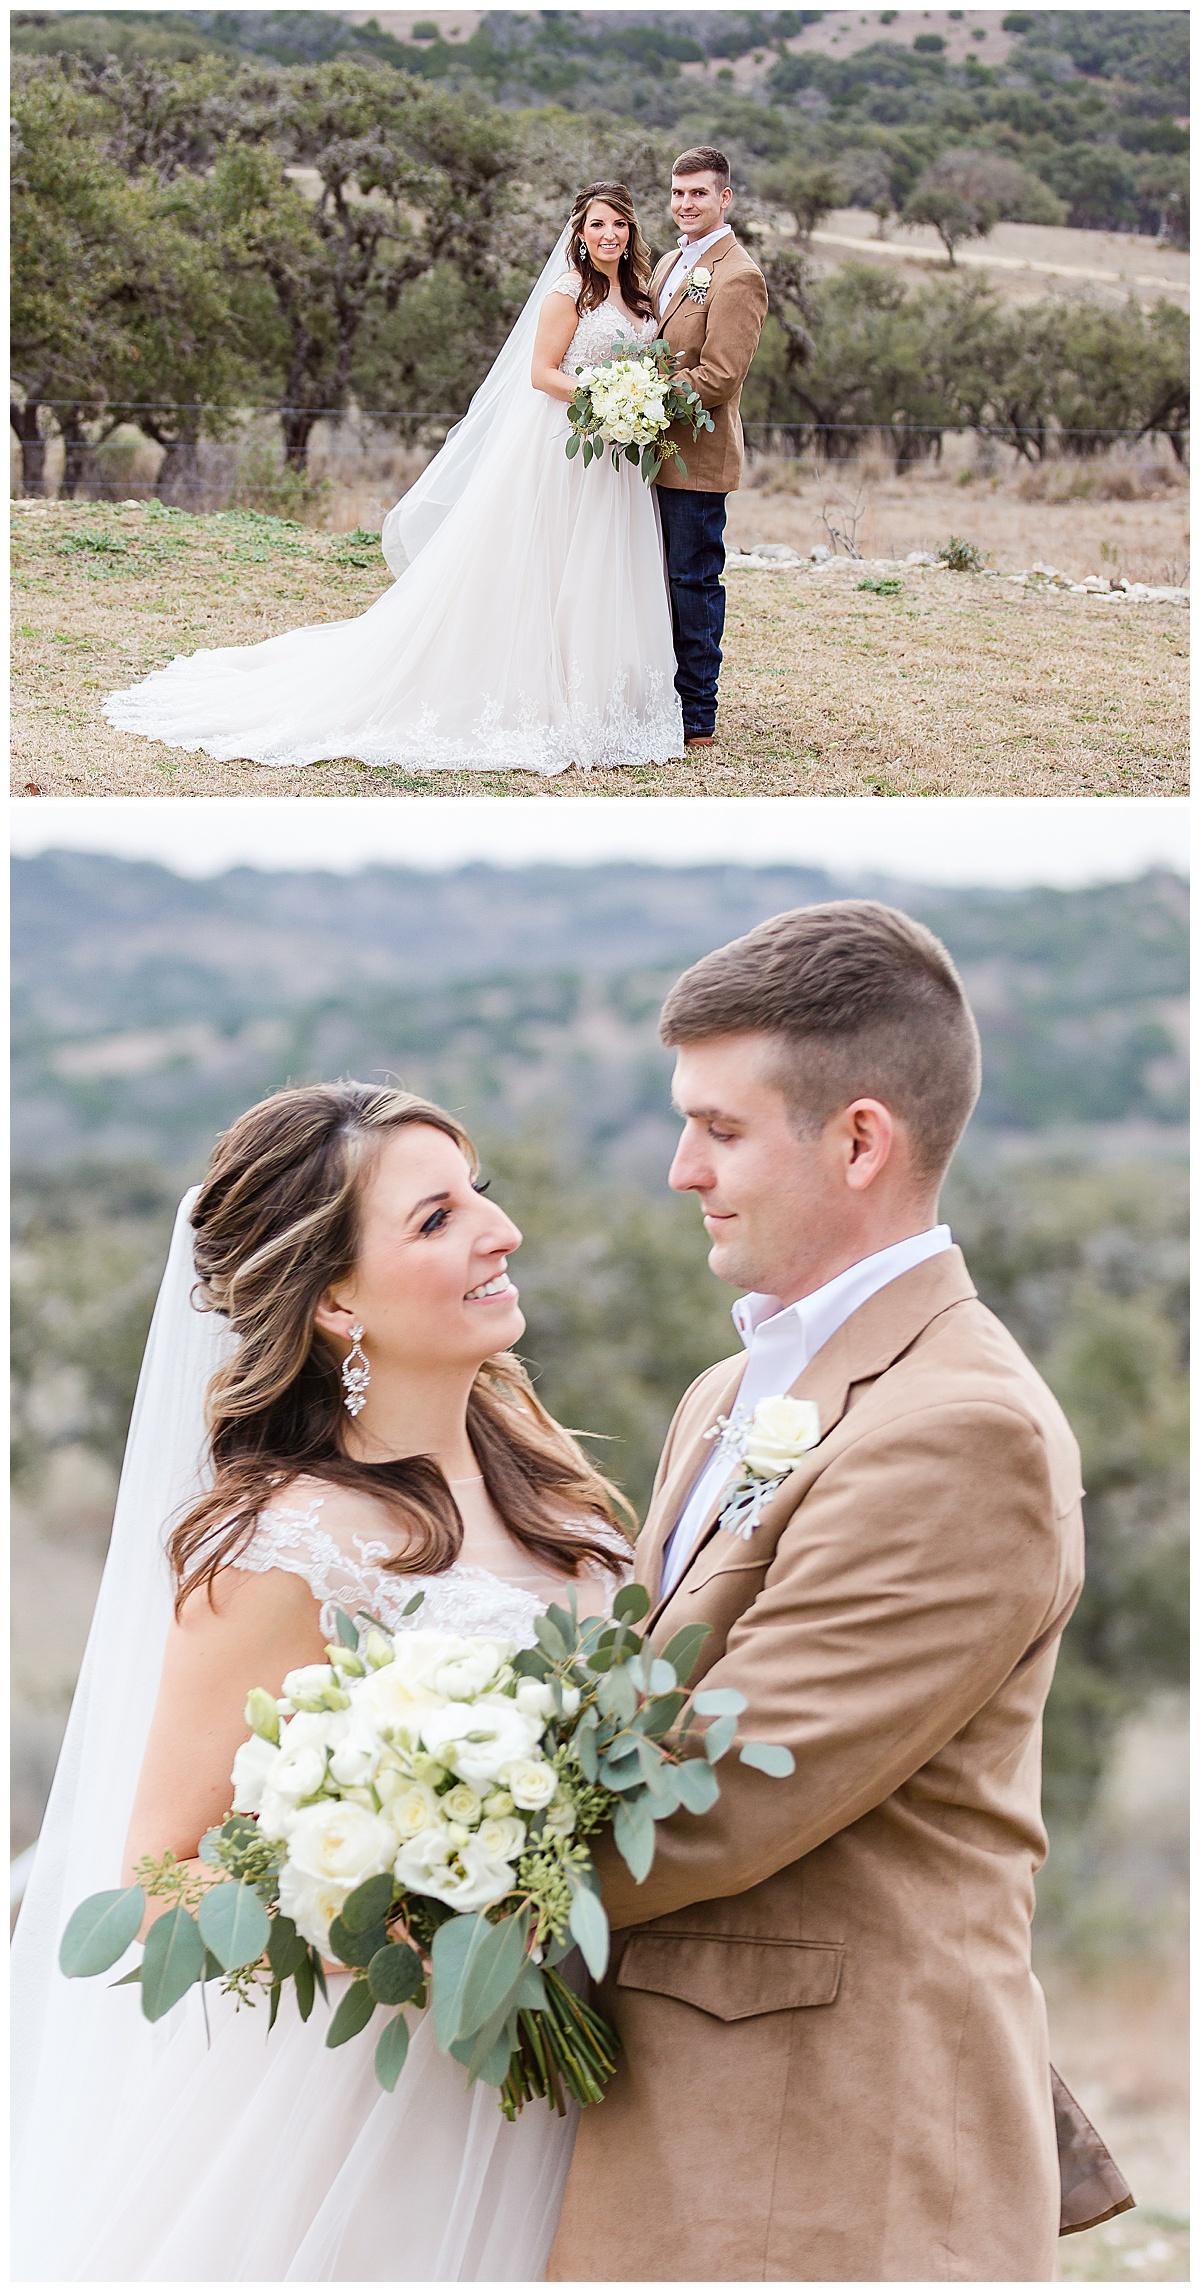 Wedding-Photographer-Texas-Hill-Country-Happy-H-Ranch-Comfor-Texas-Carly-Barton-Photography_0058.jpg